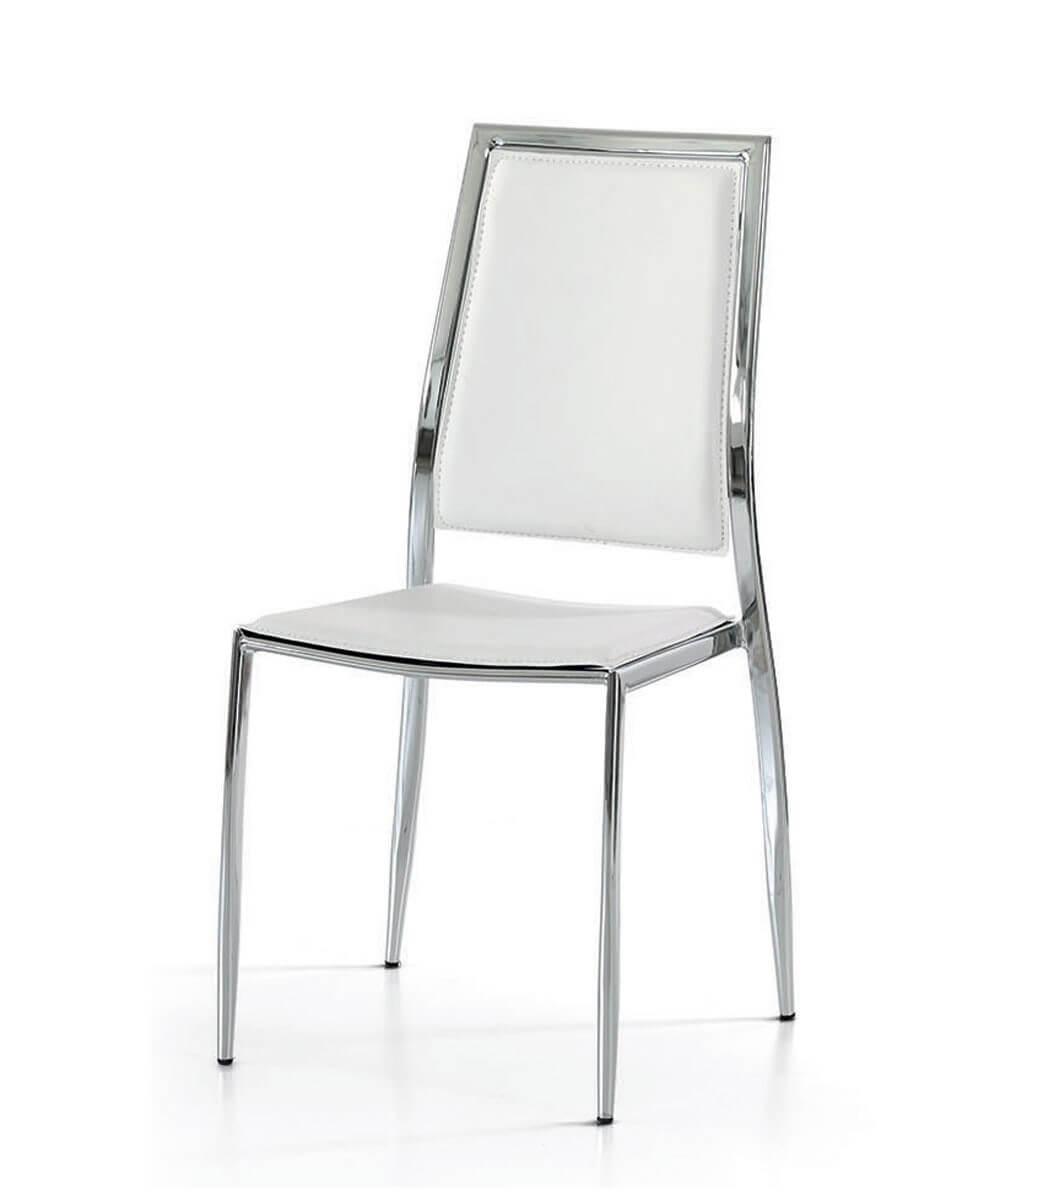 Sedia con telaio in acciaio cromato ed ecopelle bianca for Sedie nere ecopelle